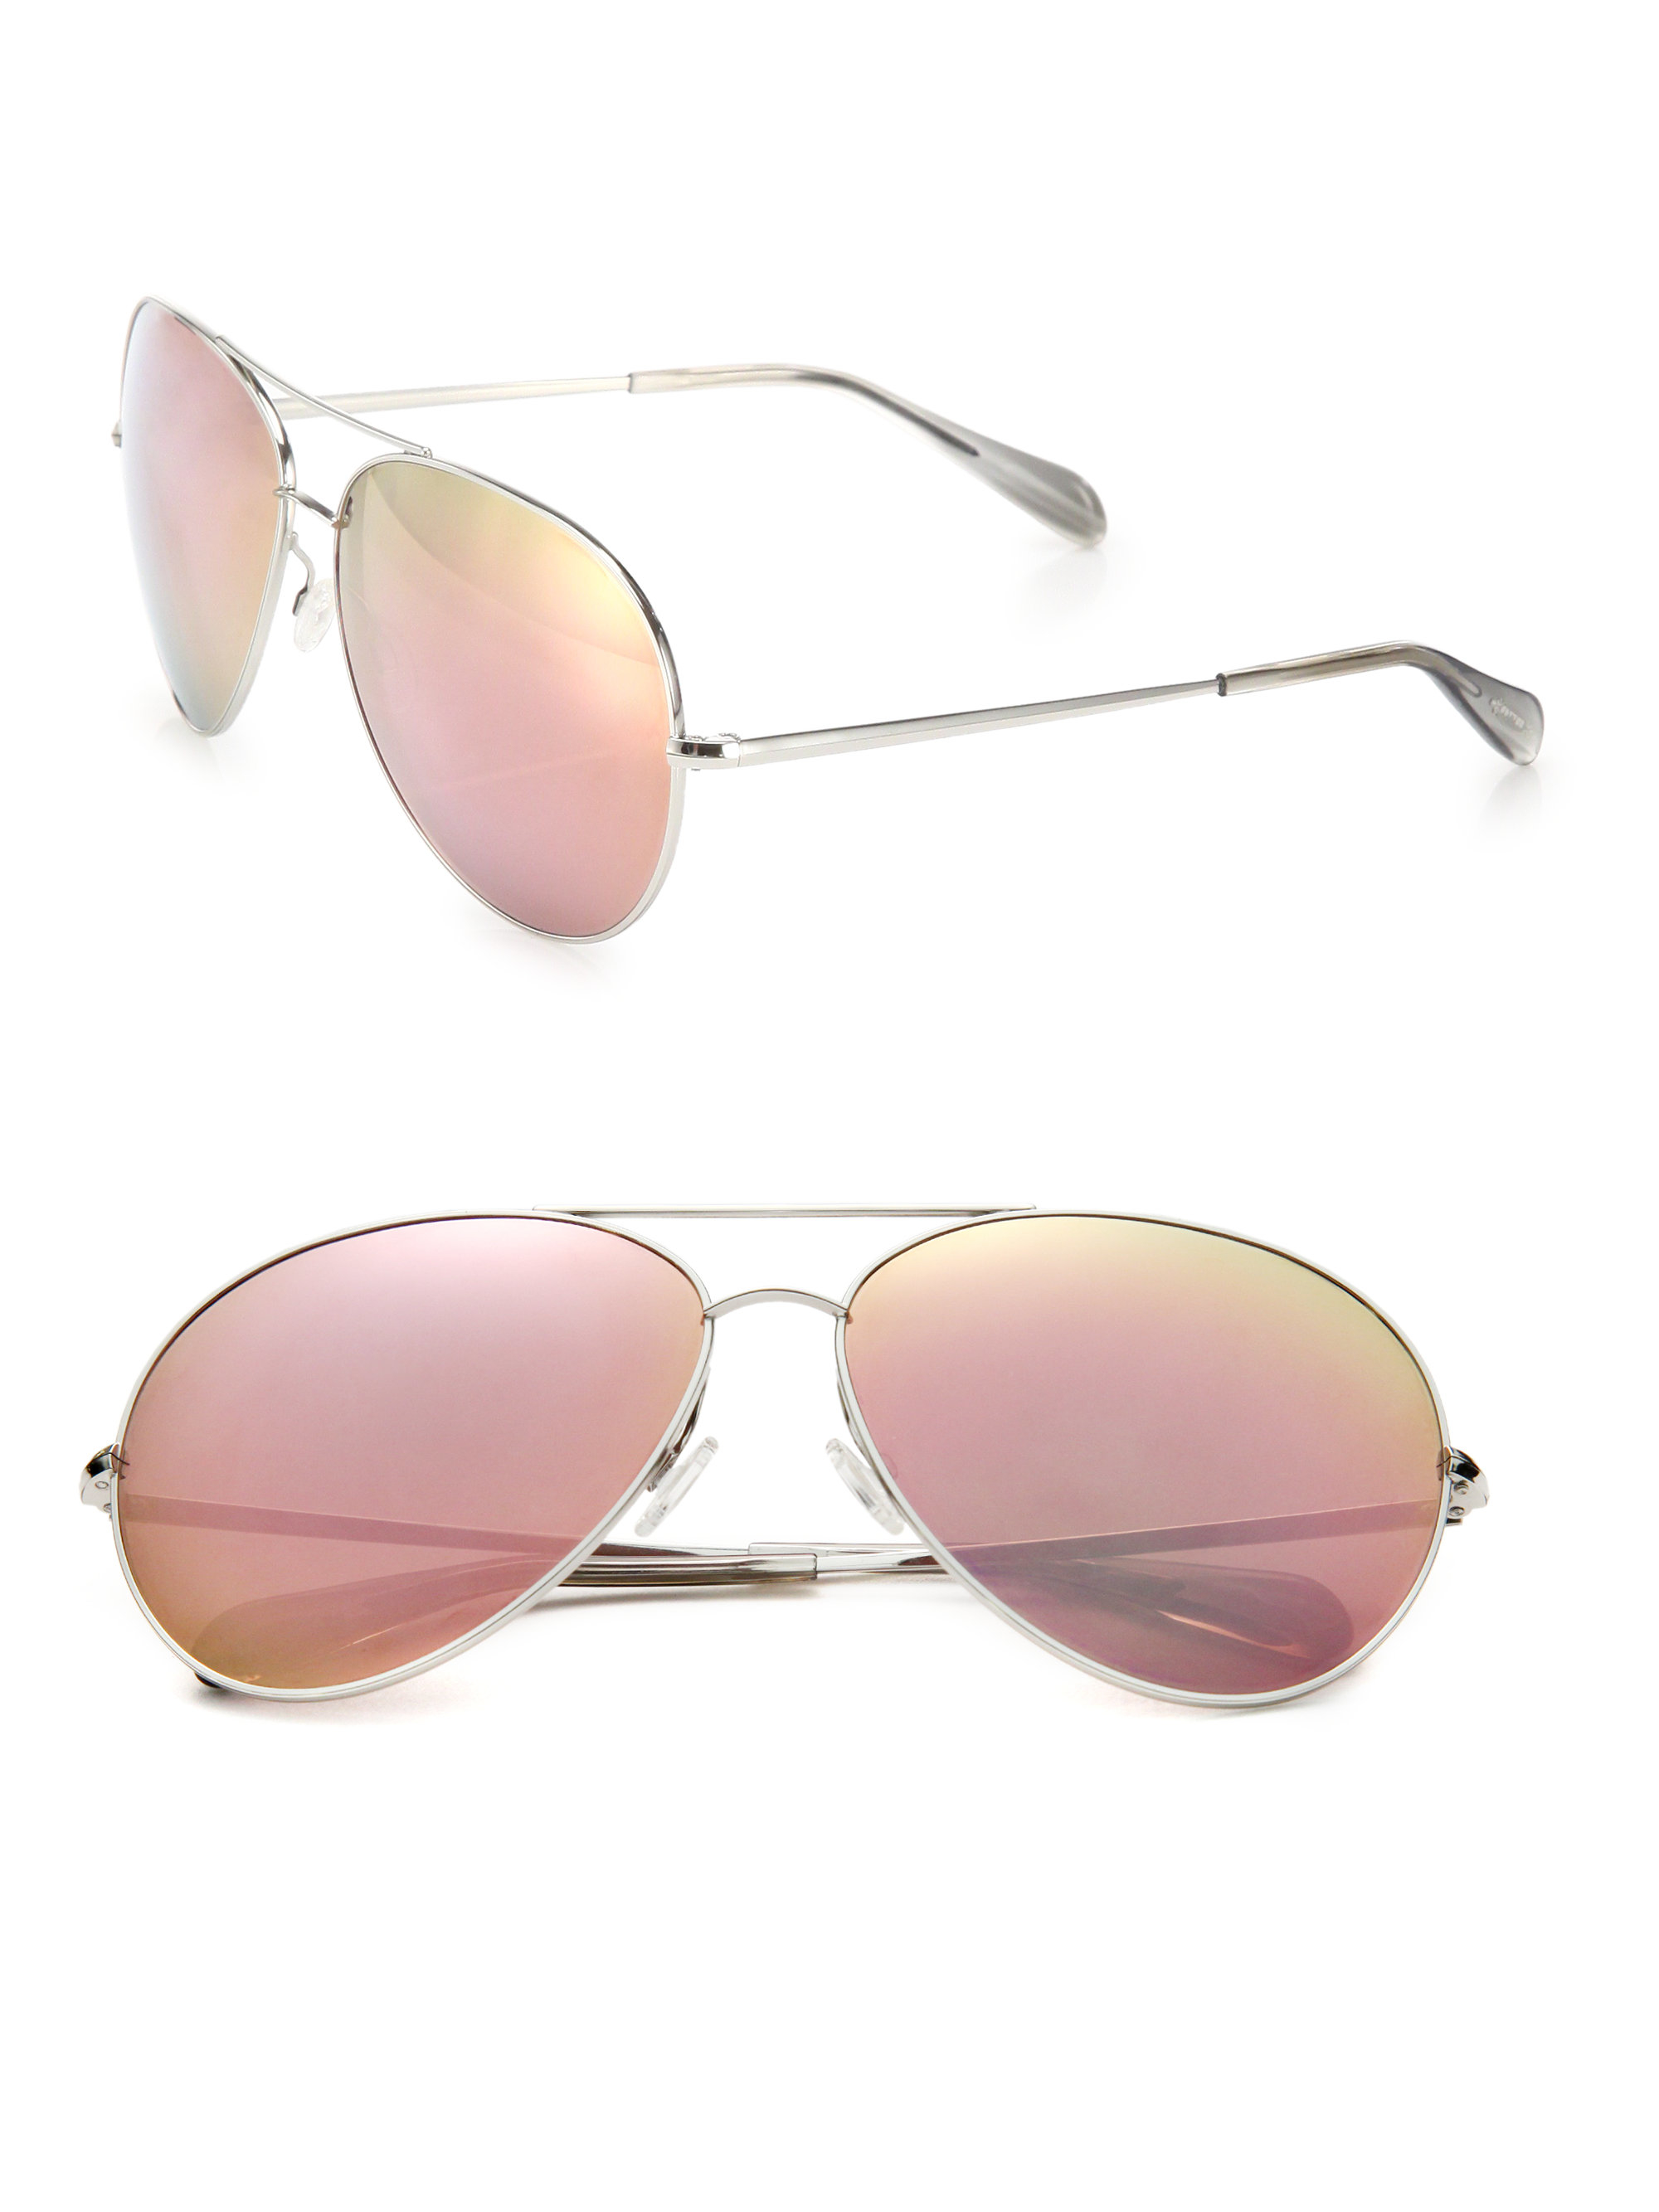 67e083fa5 Oliver Peoples Sayer Aviator Sunglasses in Metallic - Lyst